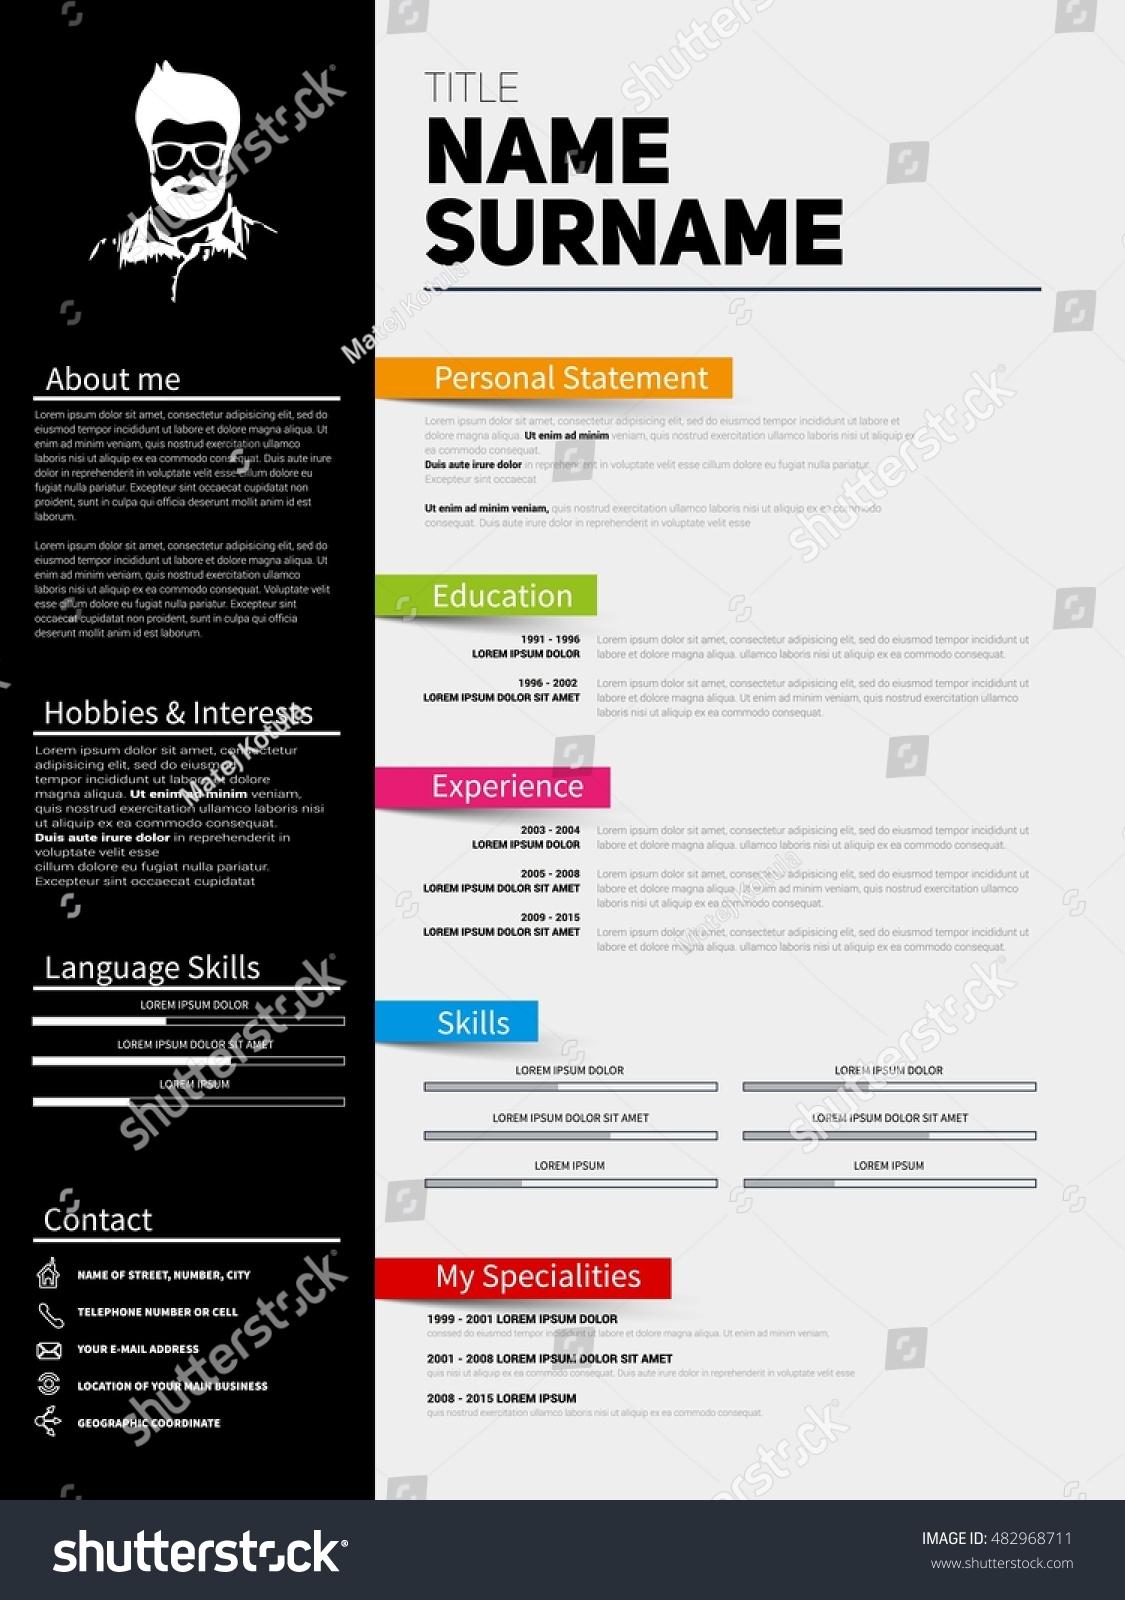 minimalist cv resume template simple design stock vector